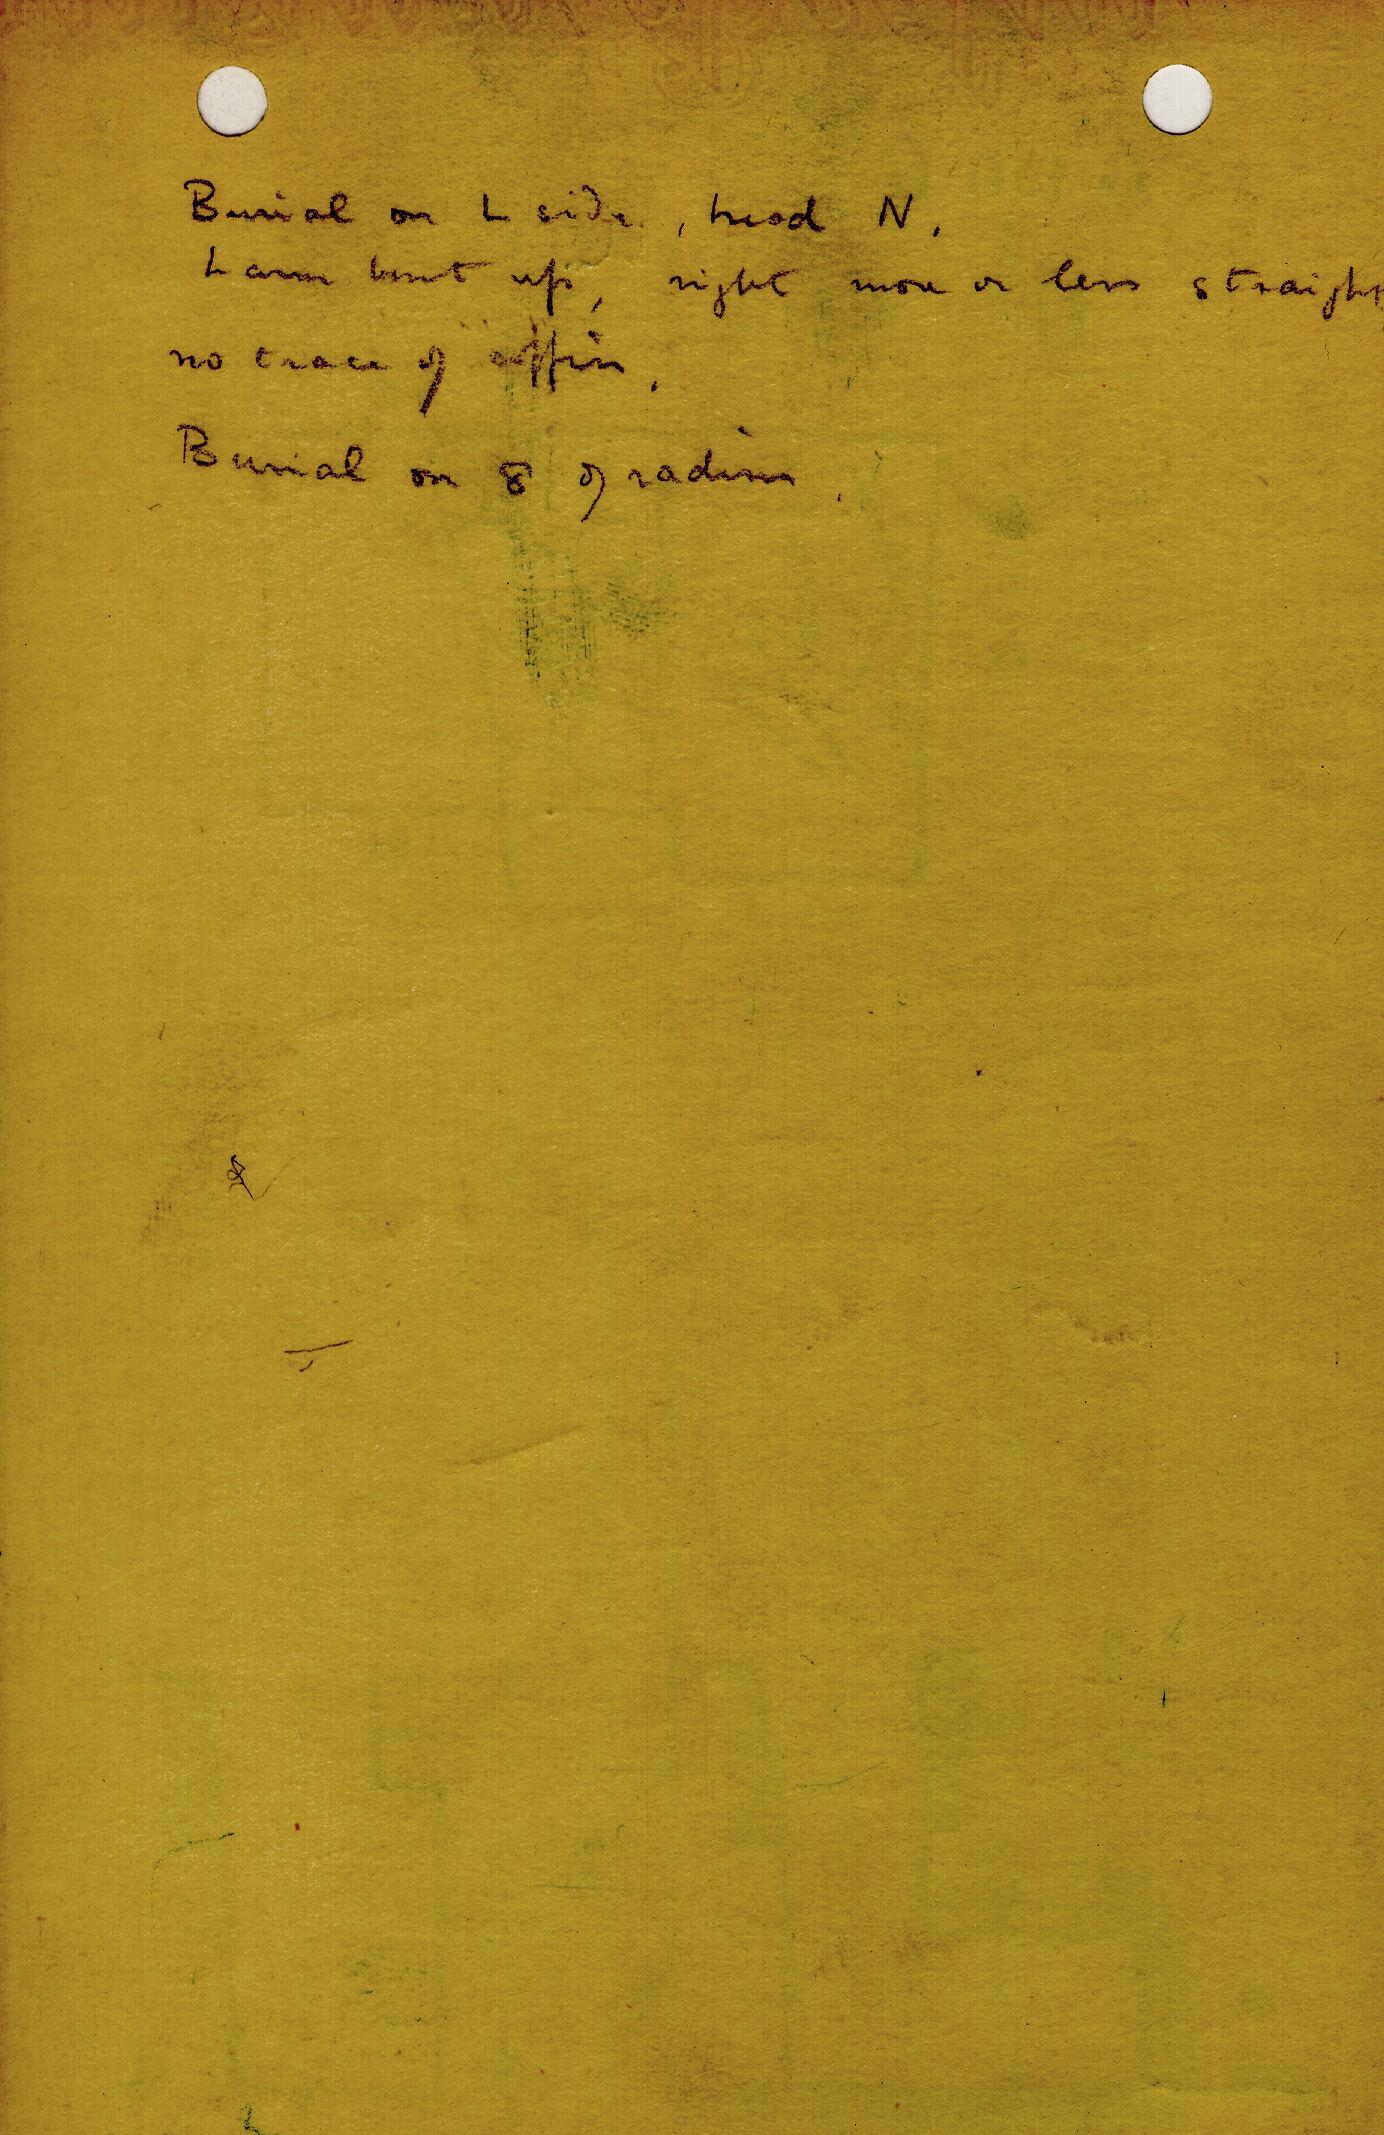 Notes: G 1311, Shaft U, notes